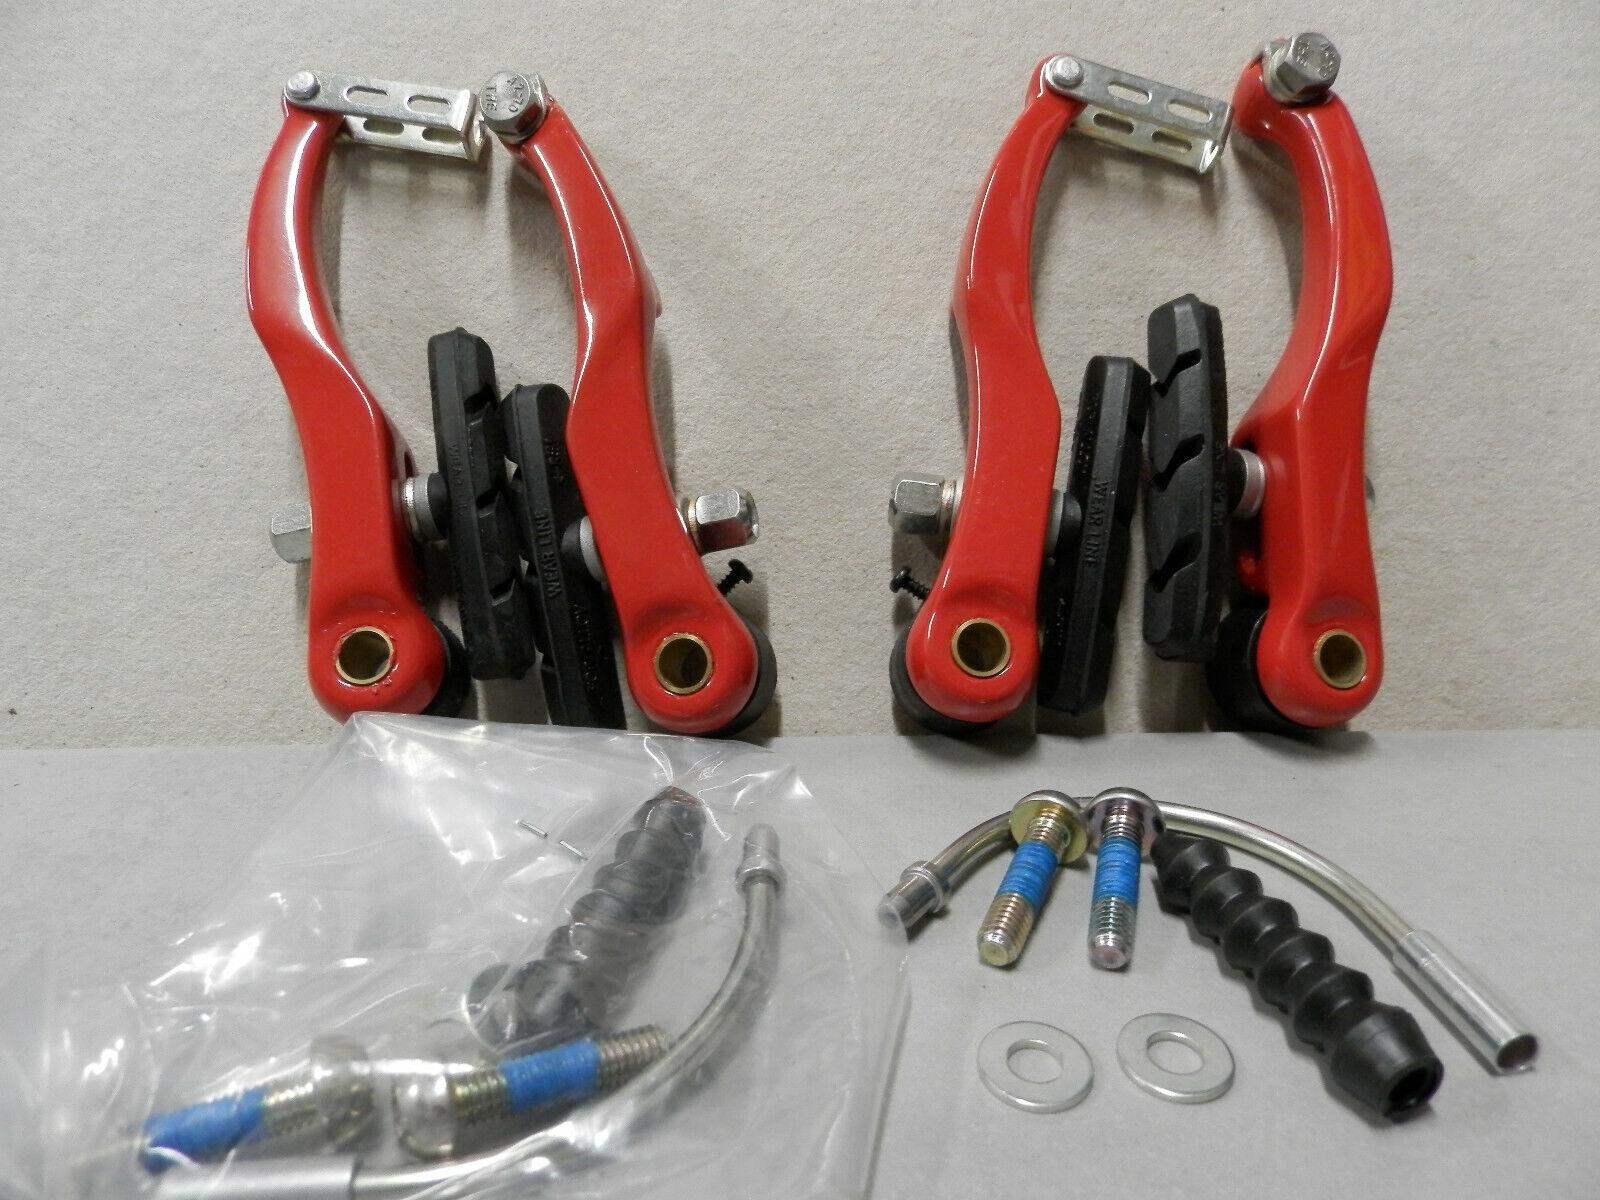 Fahrradbremse Felgenbremse Reparatur Bremse Komplet m Zug u Hebel Satz 15105